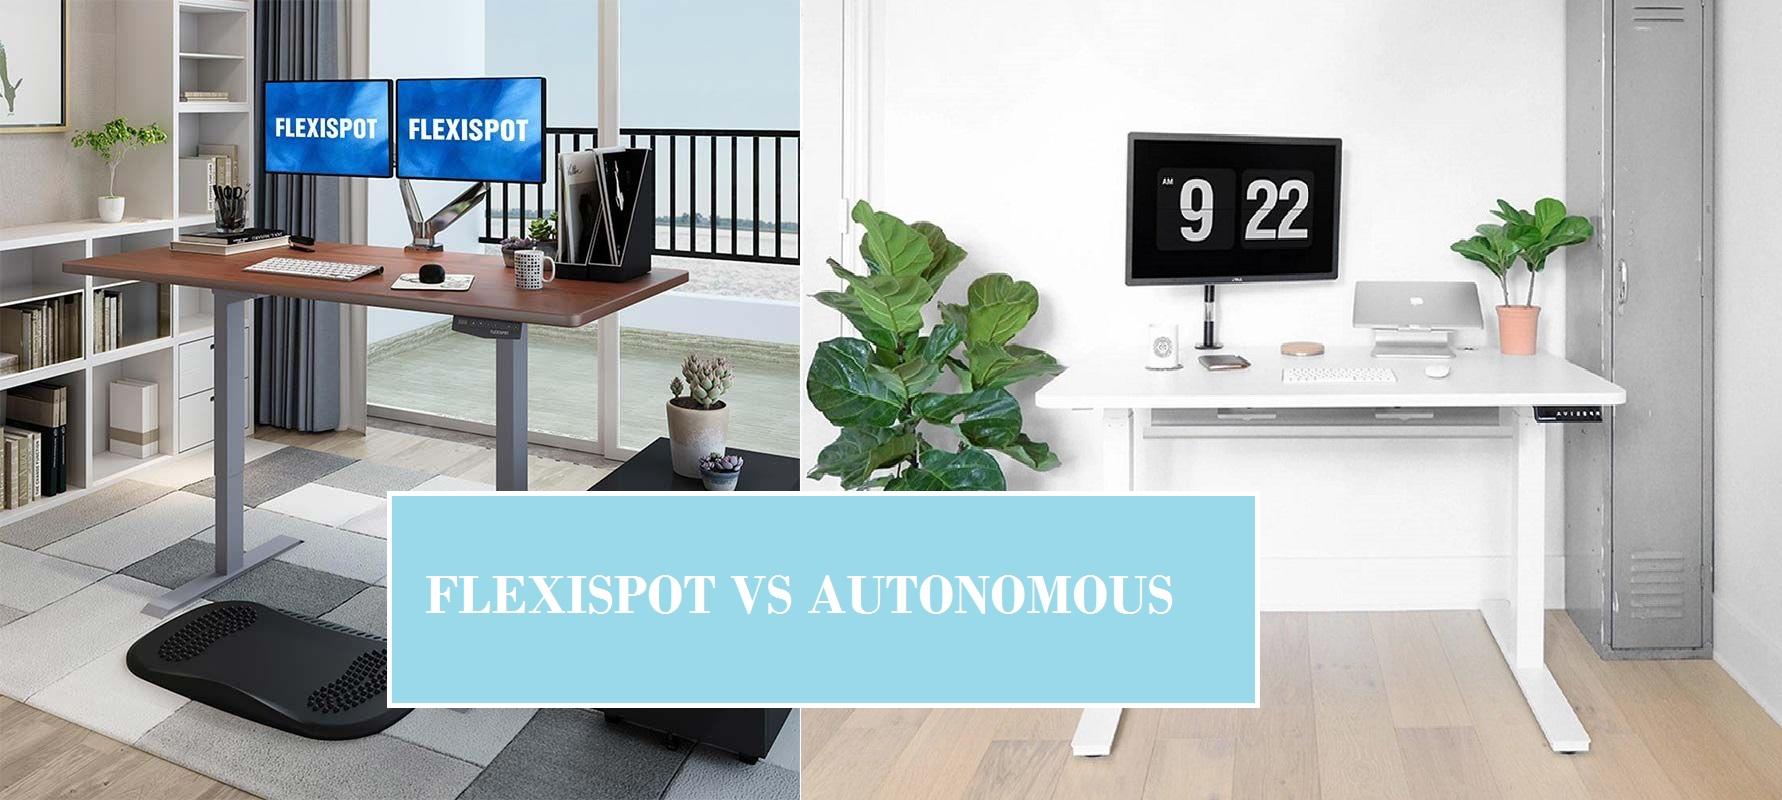 flexispot vs autonomous